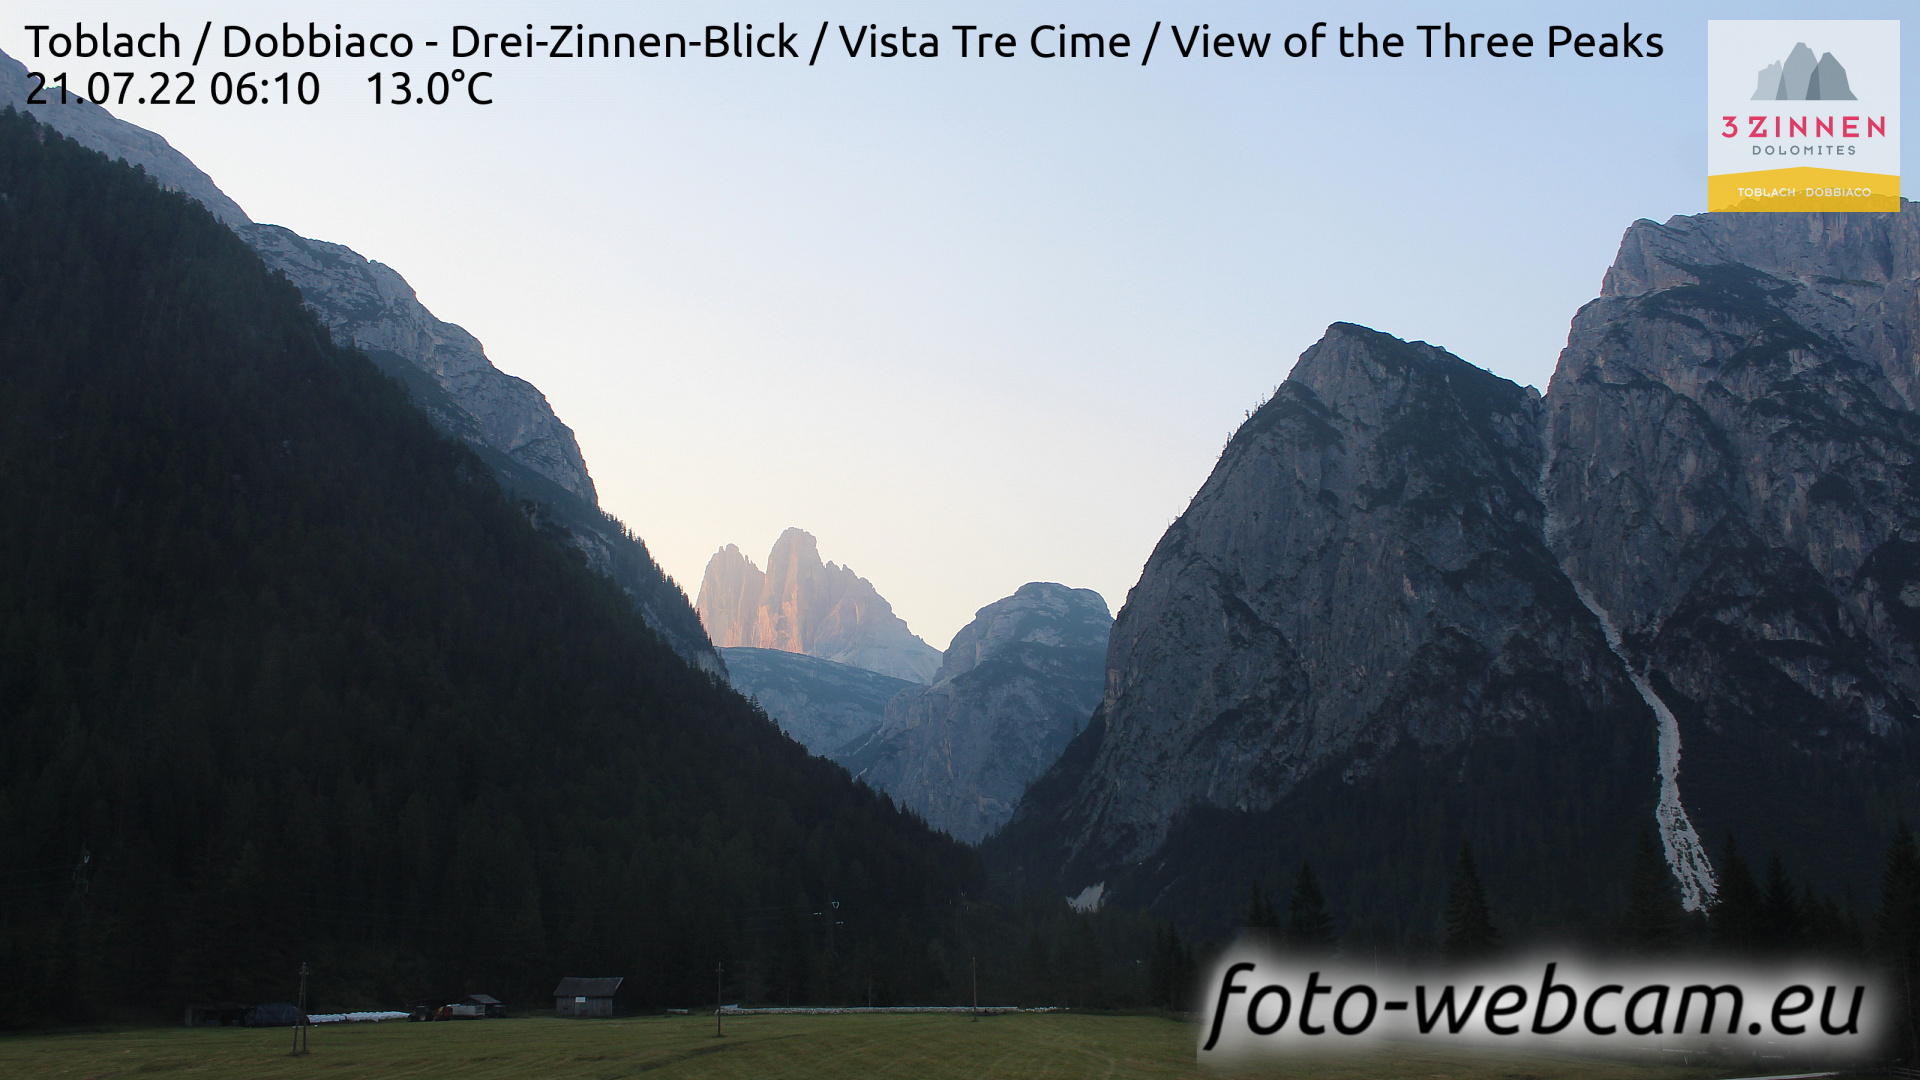 Toblach (Dolomites) Tue. 06:27